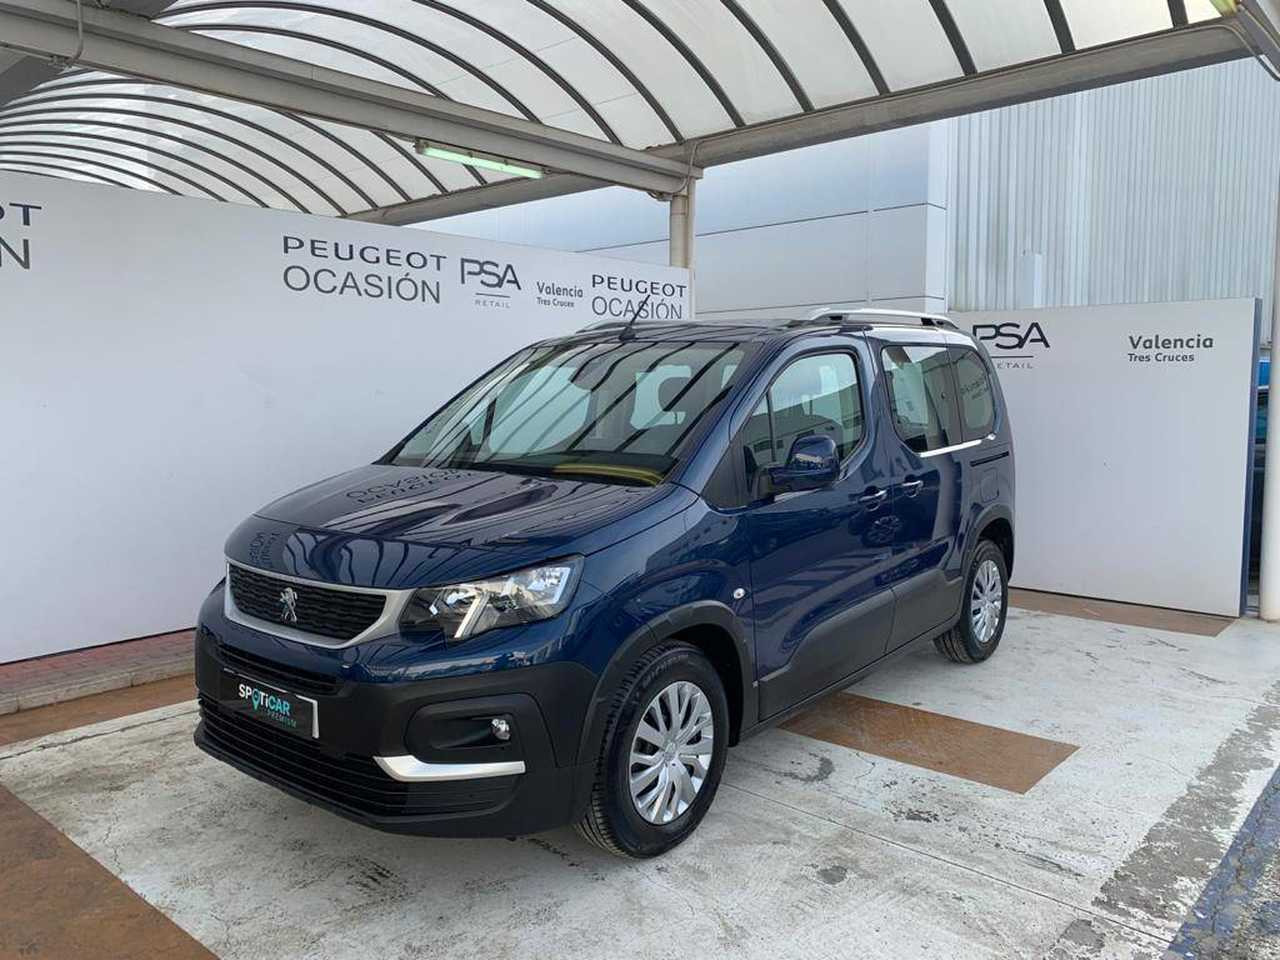 Peugeot Rifter Gasolina en Paterna